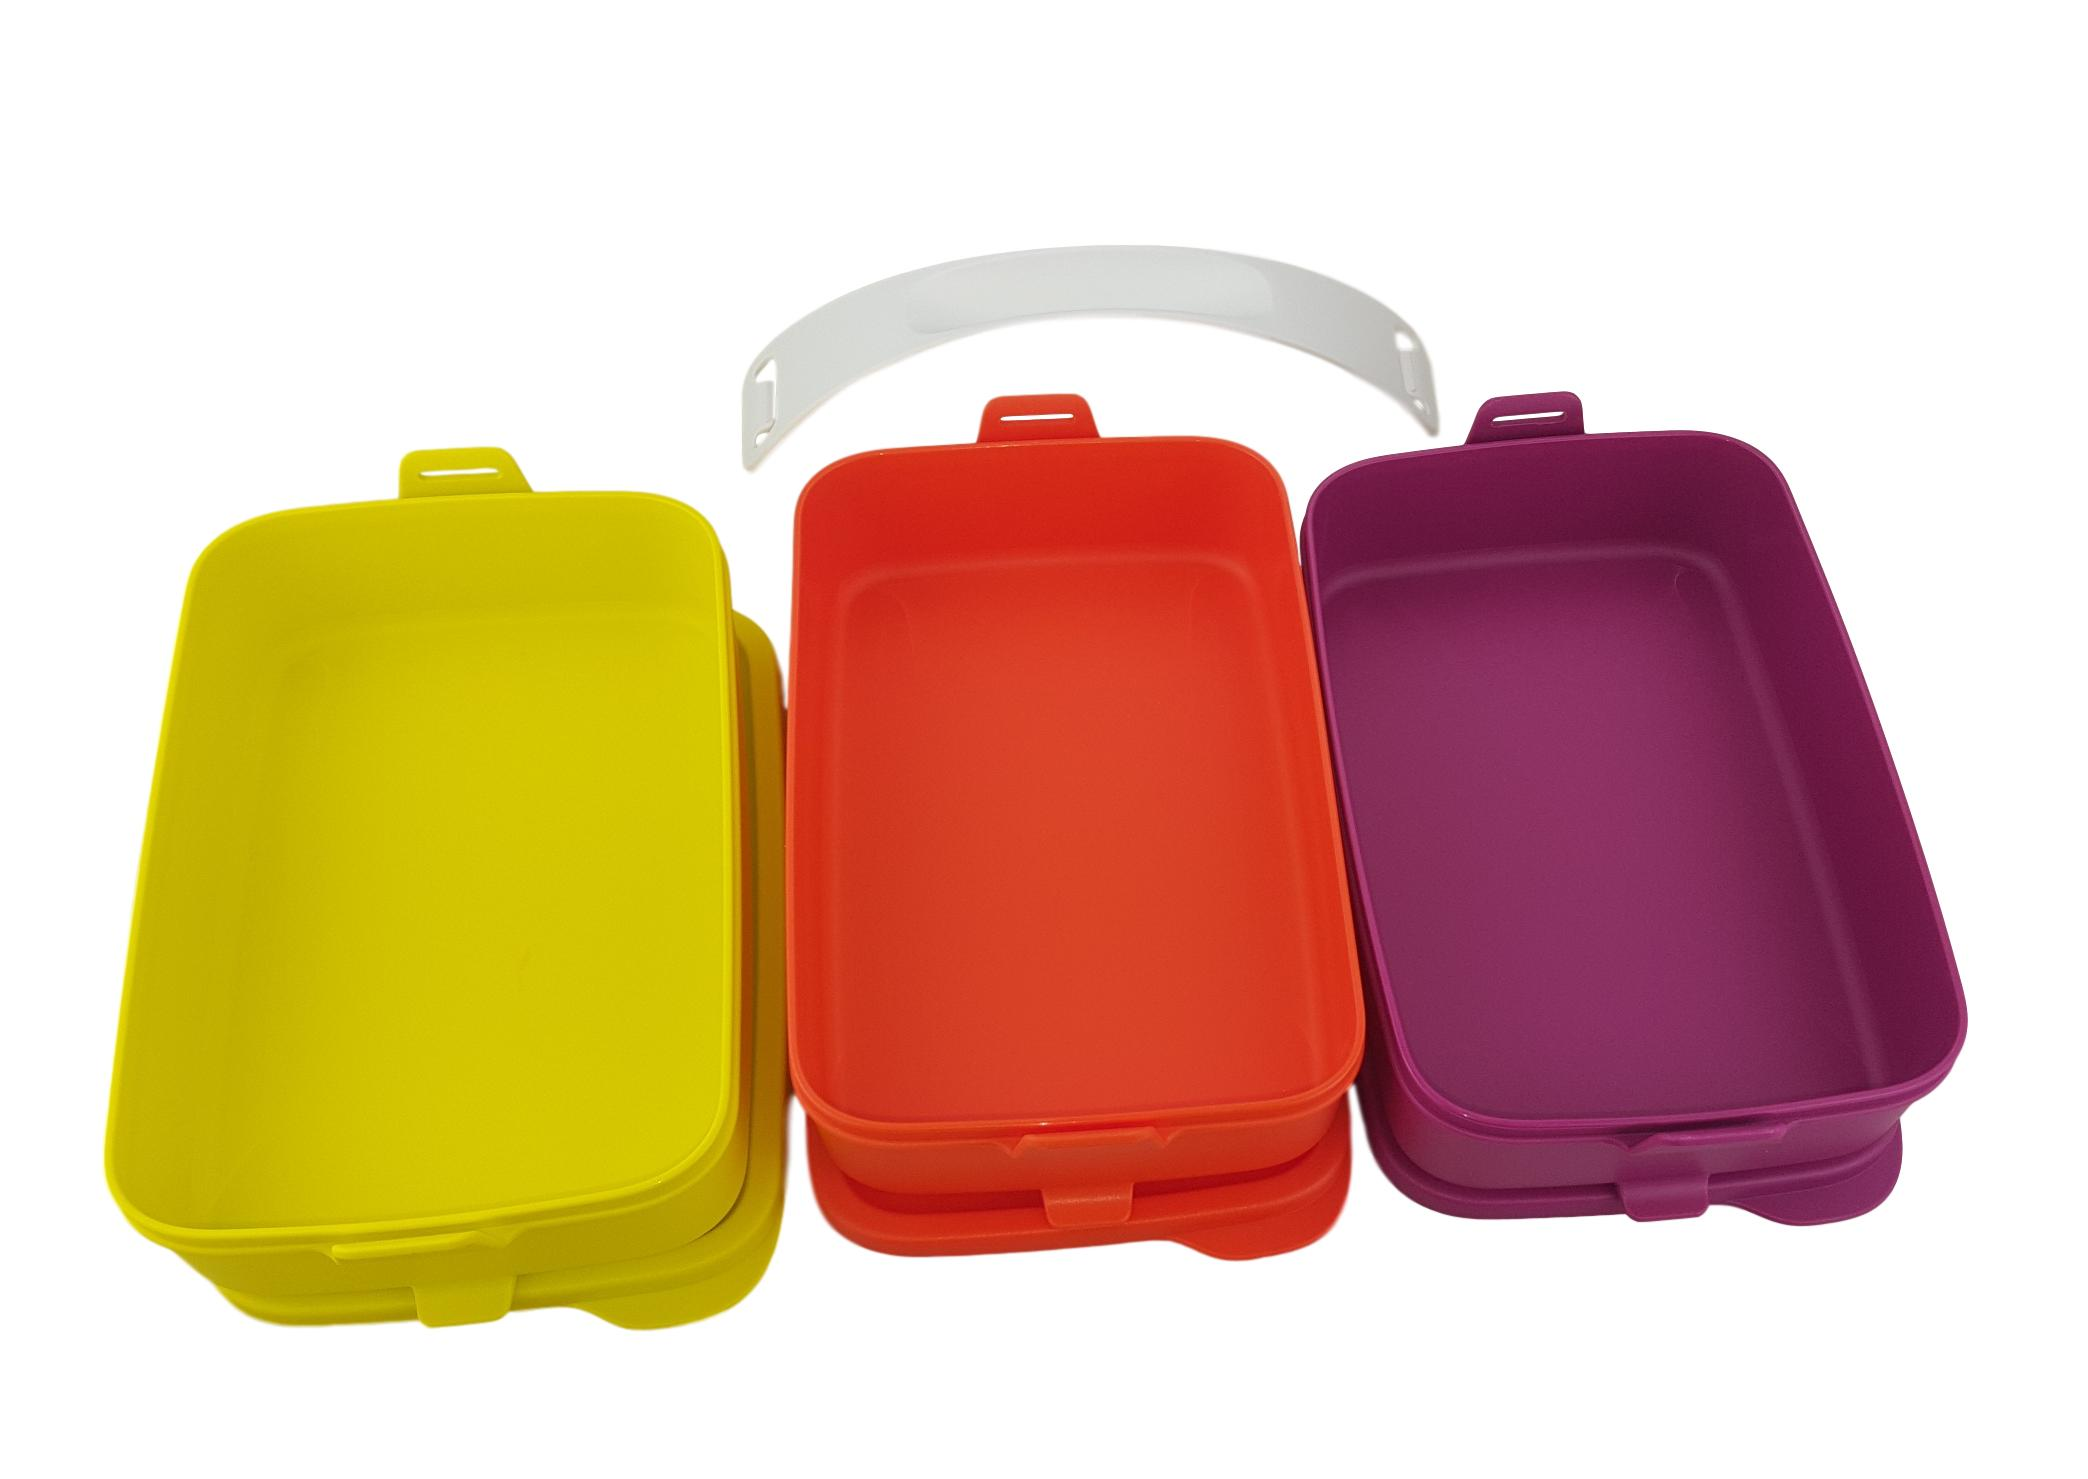 Kühlschrank Dose : Tupperware tupperware stapel und klick picknick dosen set